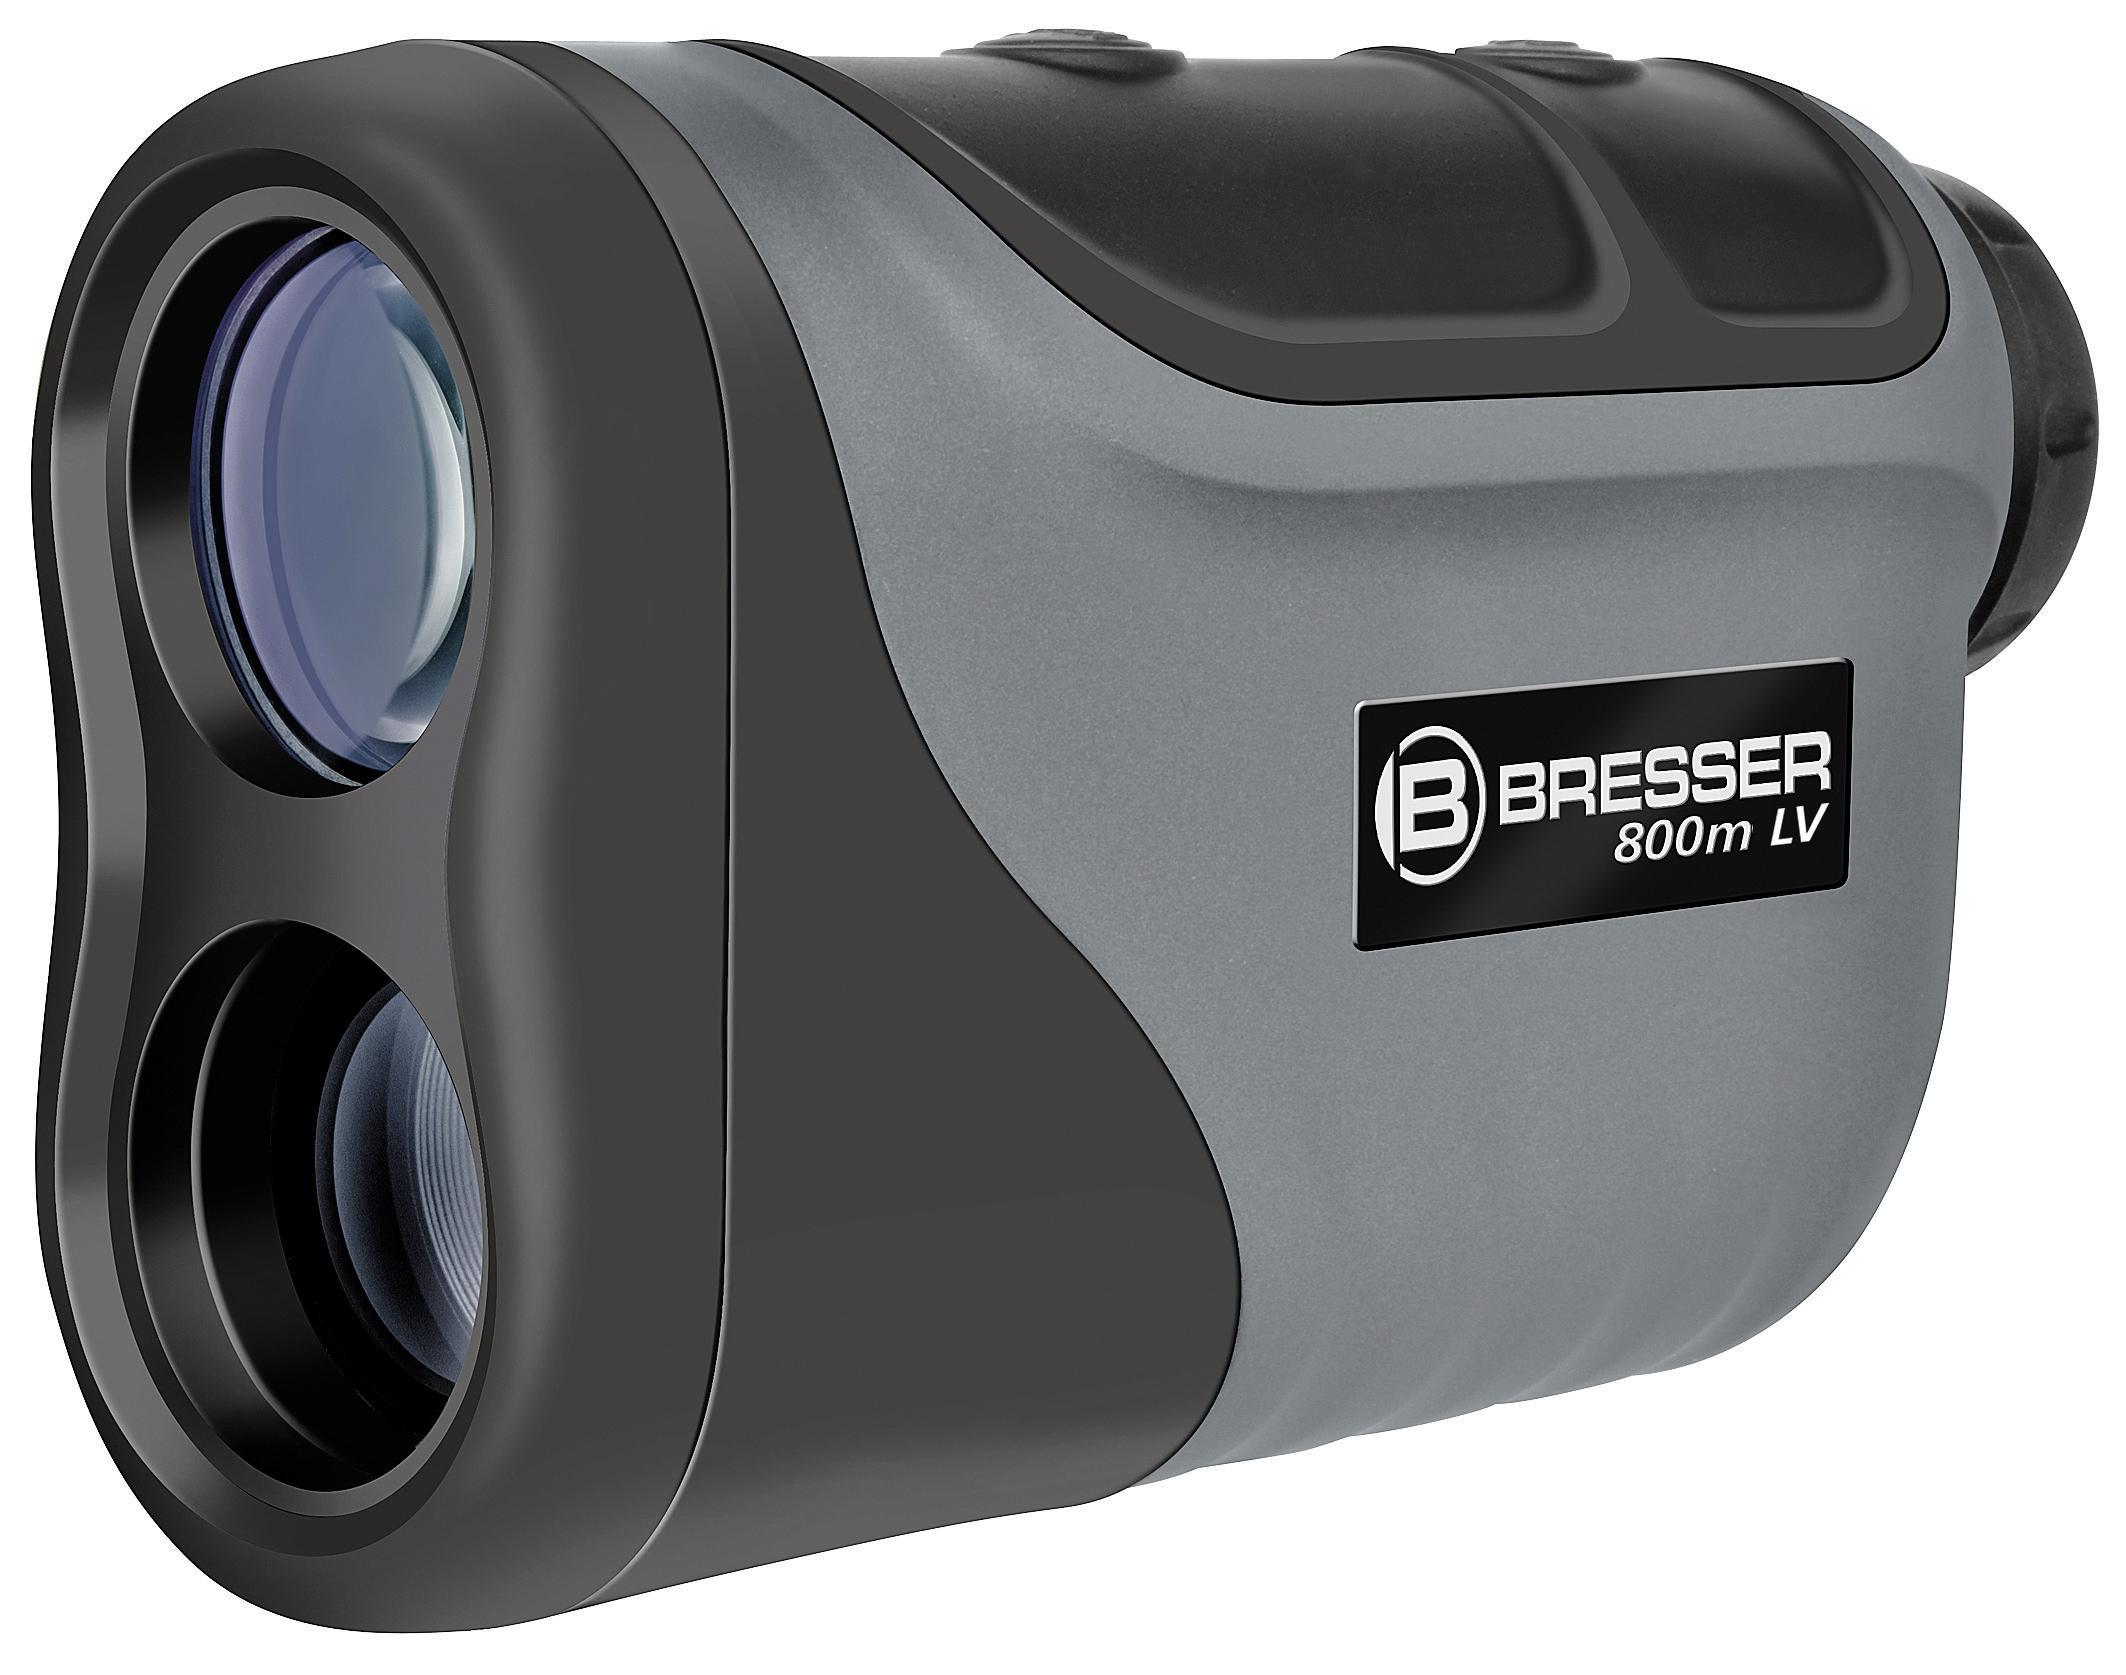 Laser Entfernungsmesser Aculon Al11 : Bresser laser entfernungsmesser mit live mode amazon kamera